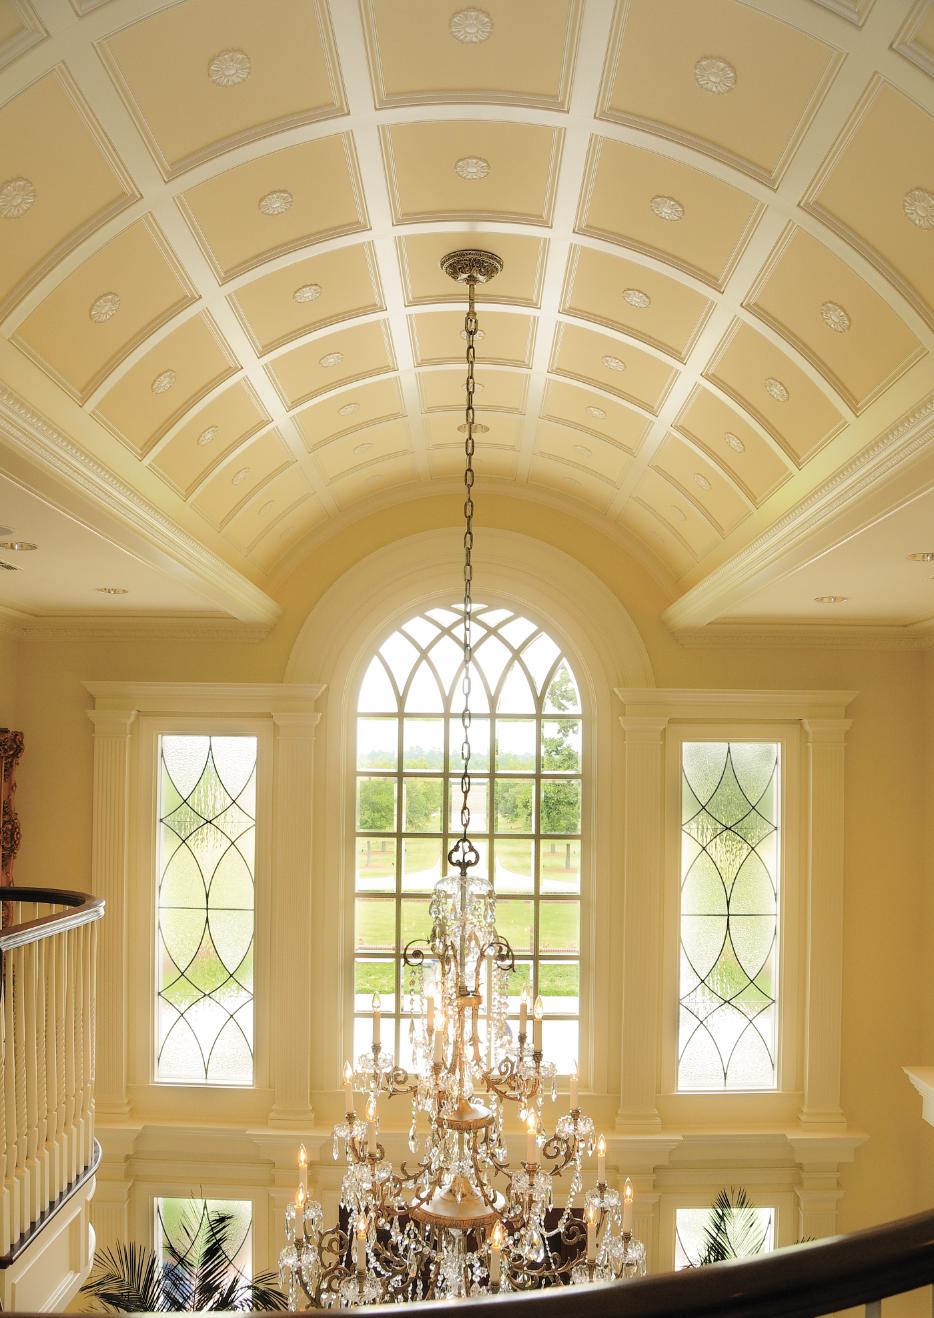 Decorative barrel ceiling plaster